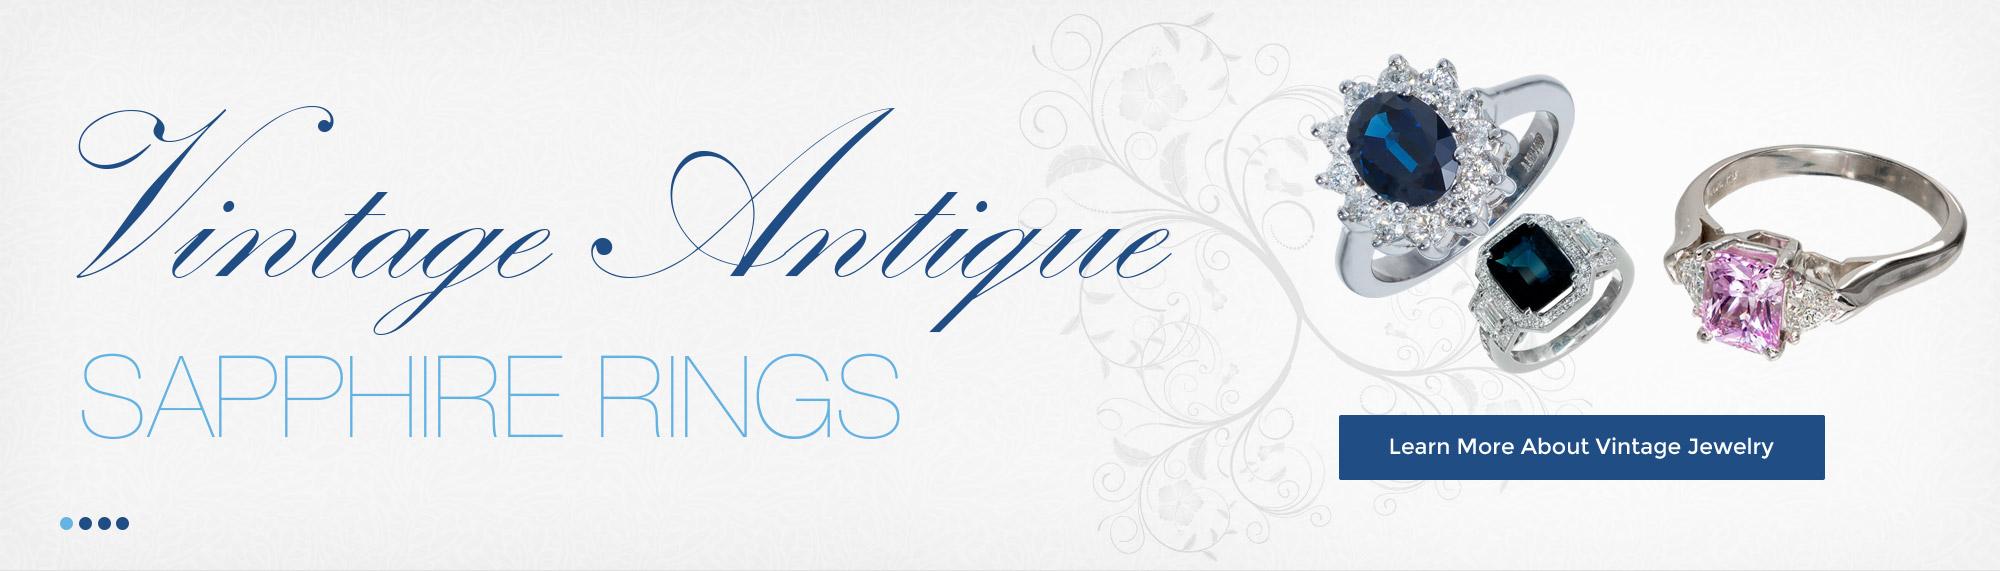 Vintage Antique Sapphire Rings